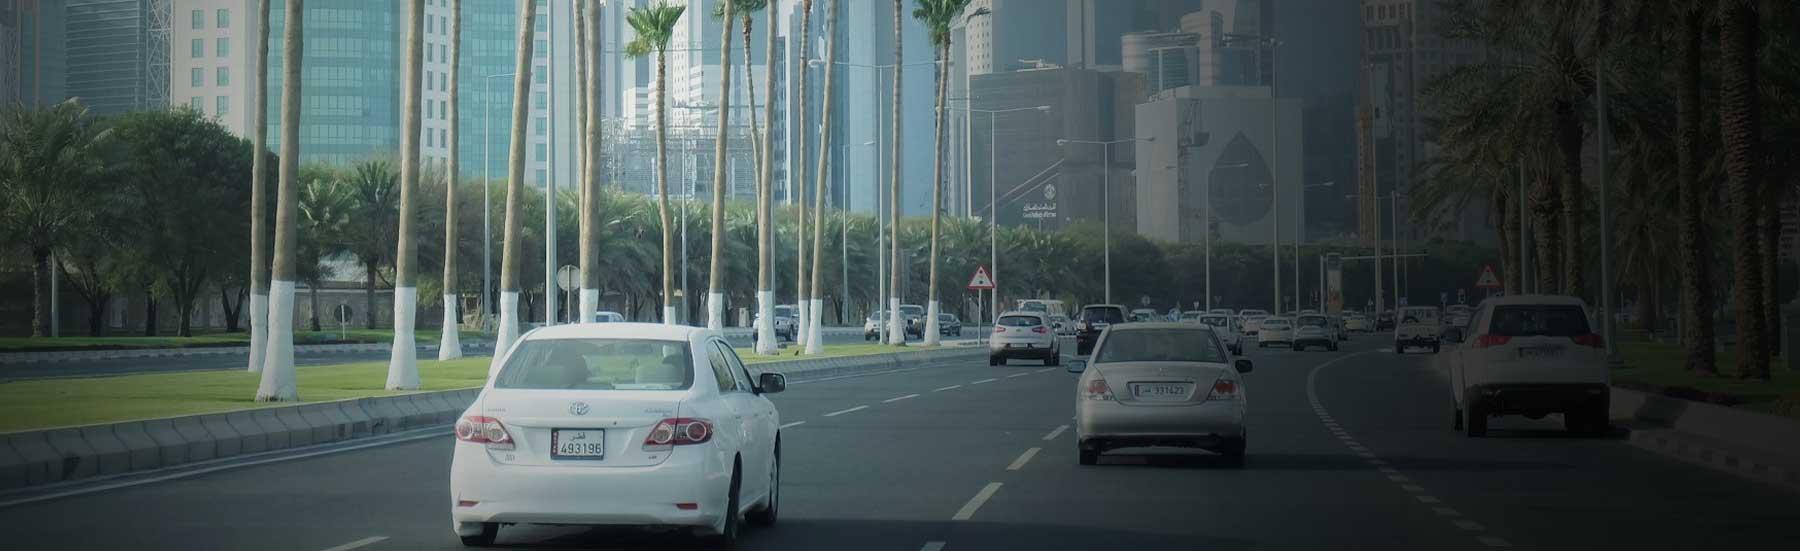 Falcon Tours Qatar | Doha city tour, Qatar City Tours, Souq